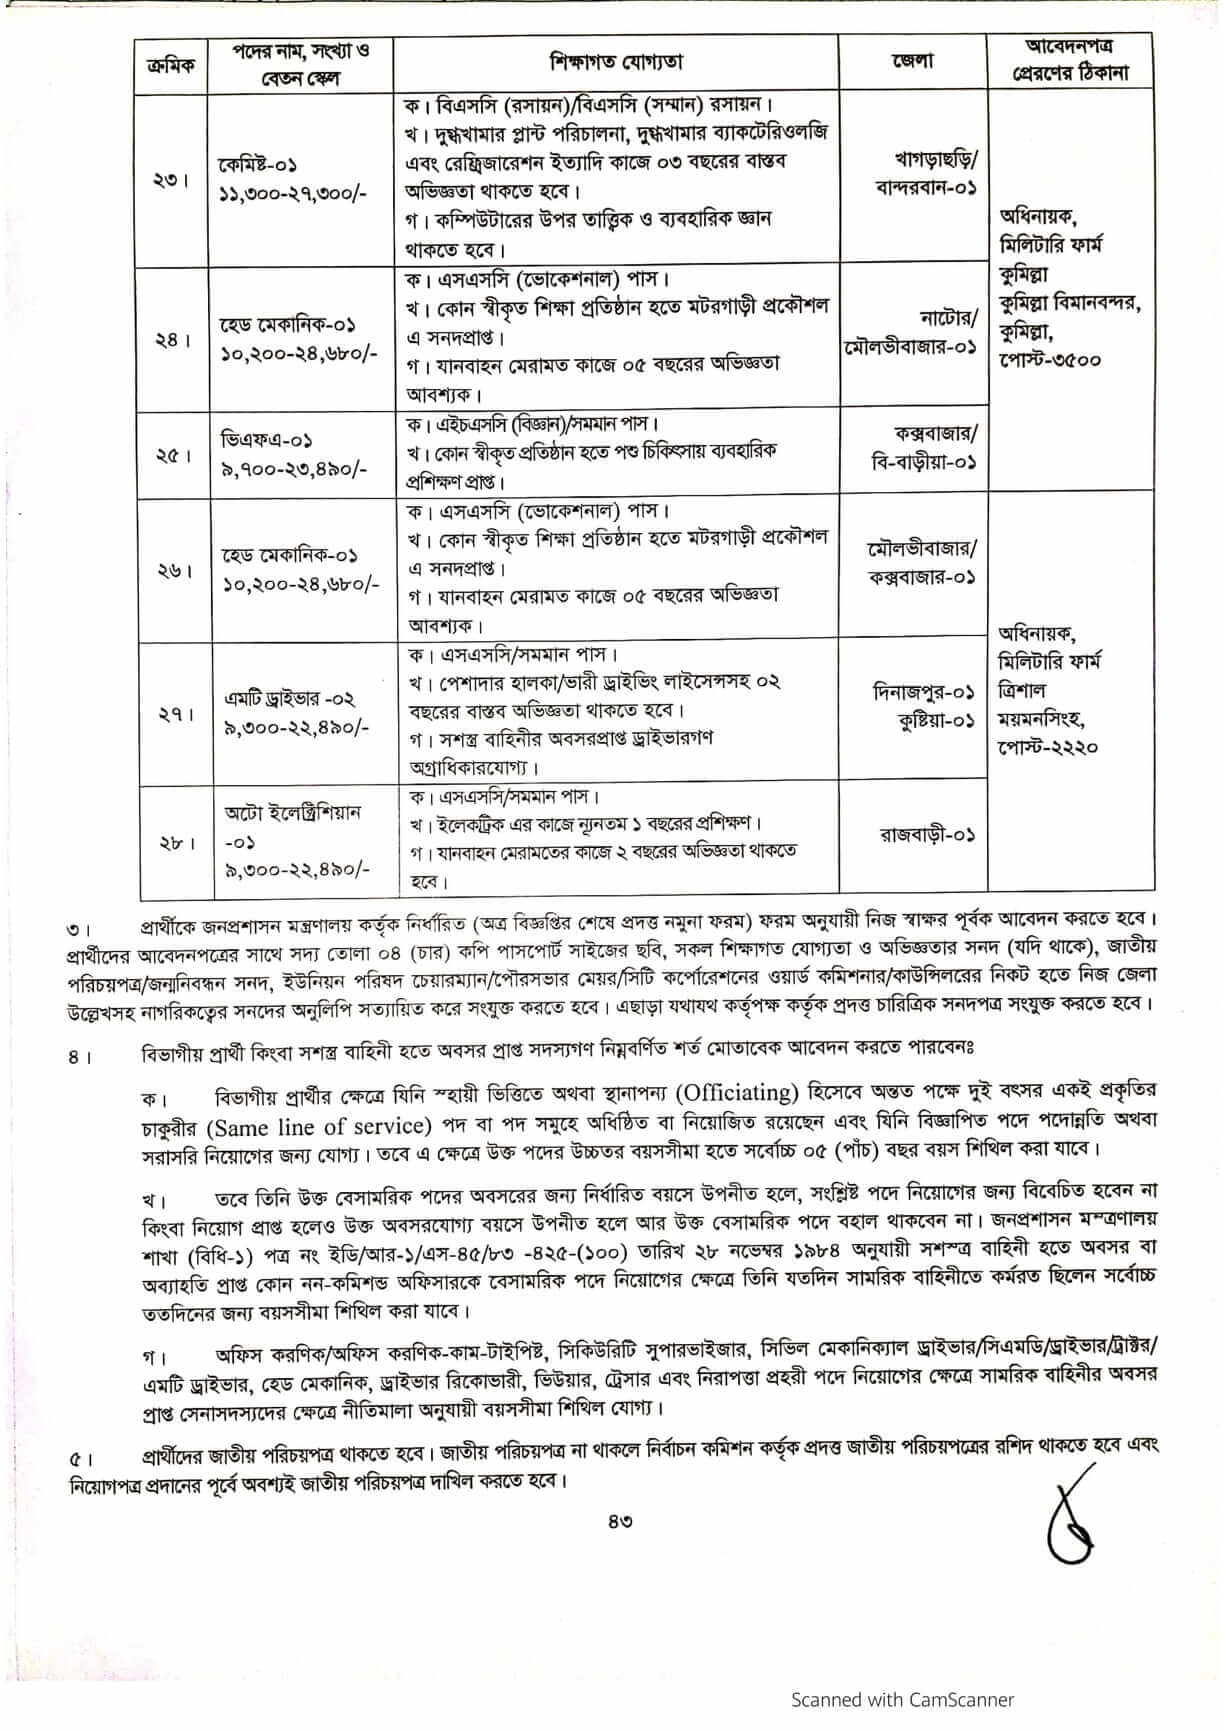 army civilian job circular pdf download